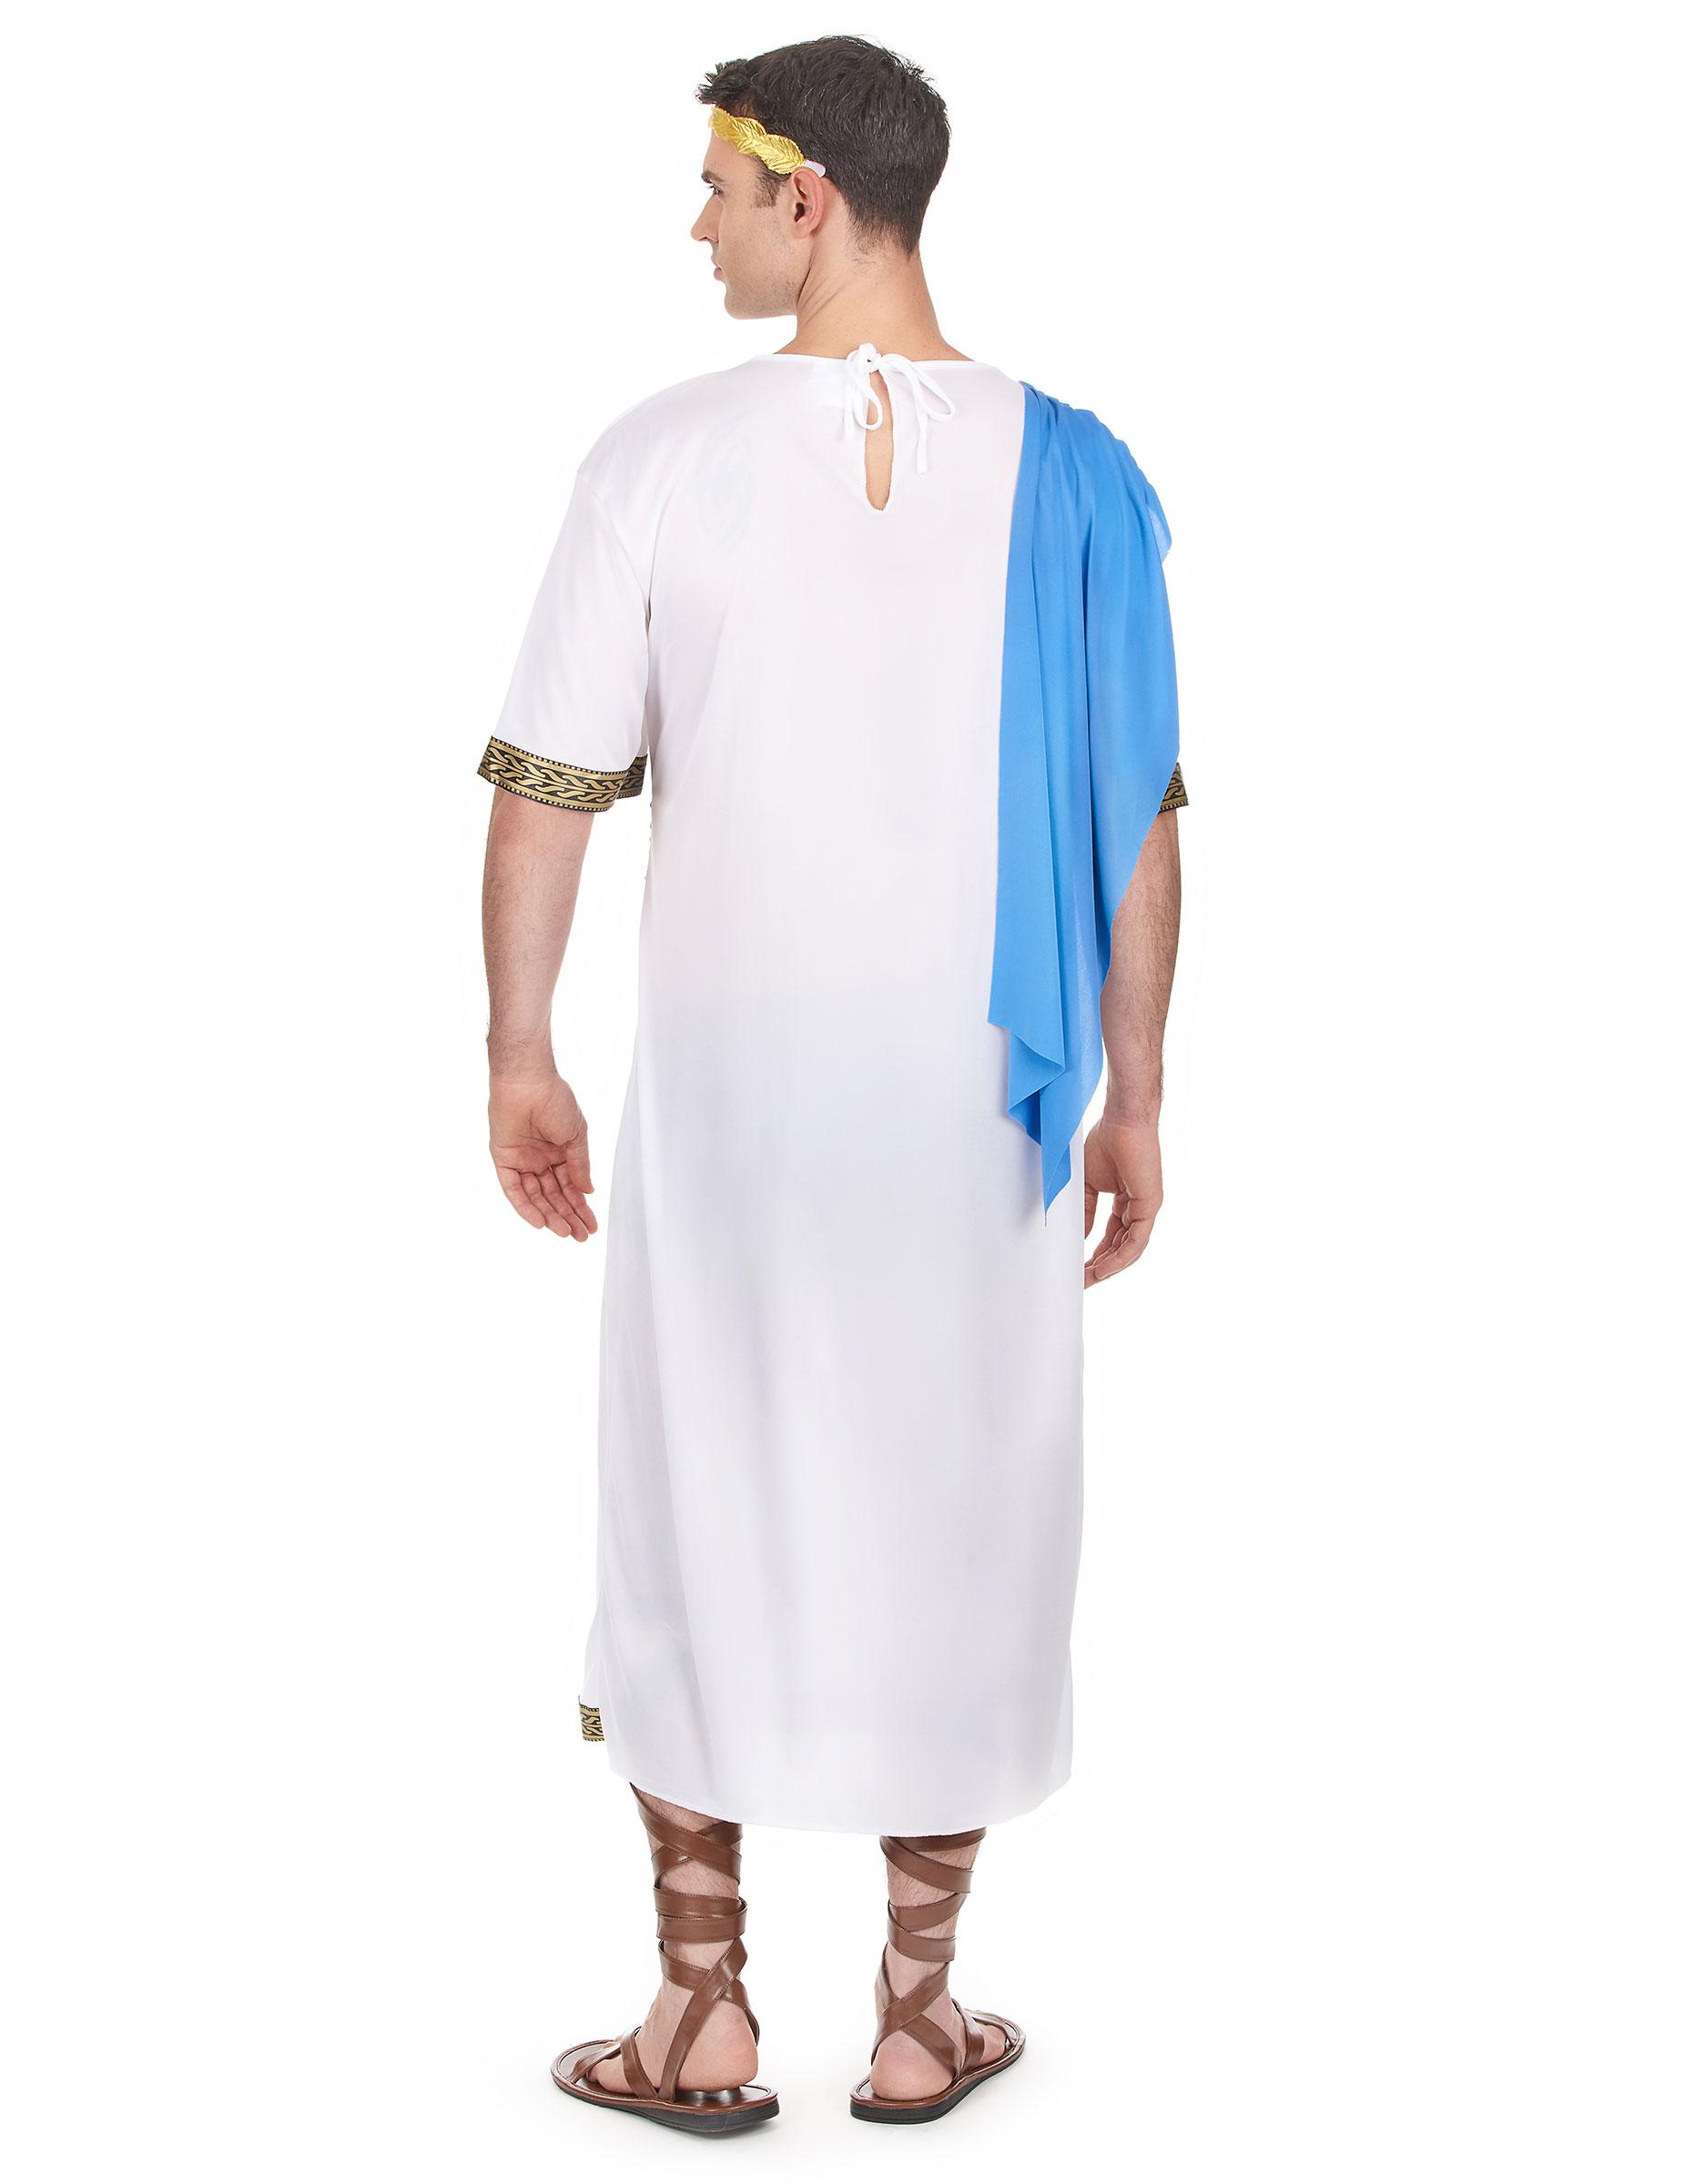 Griechischer Gott